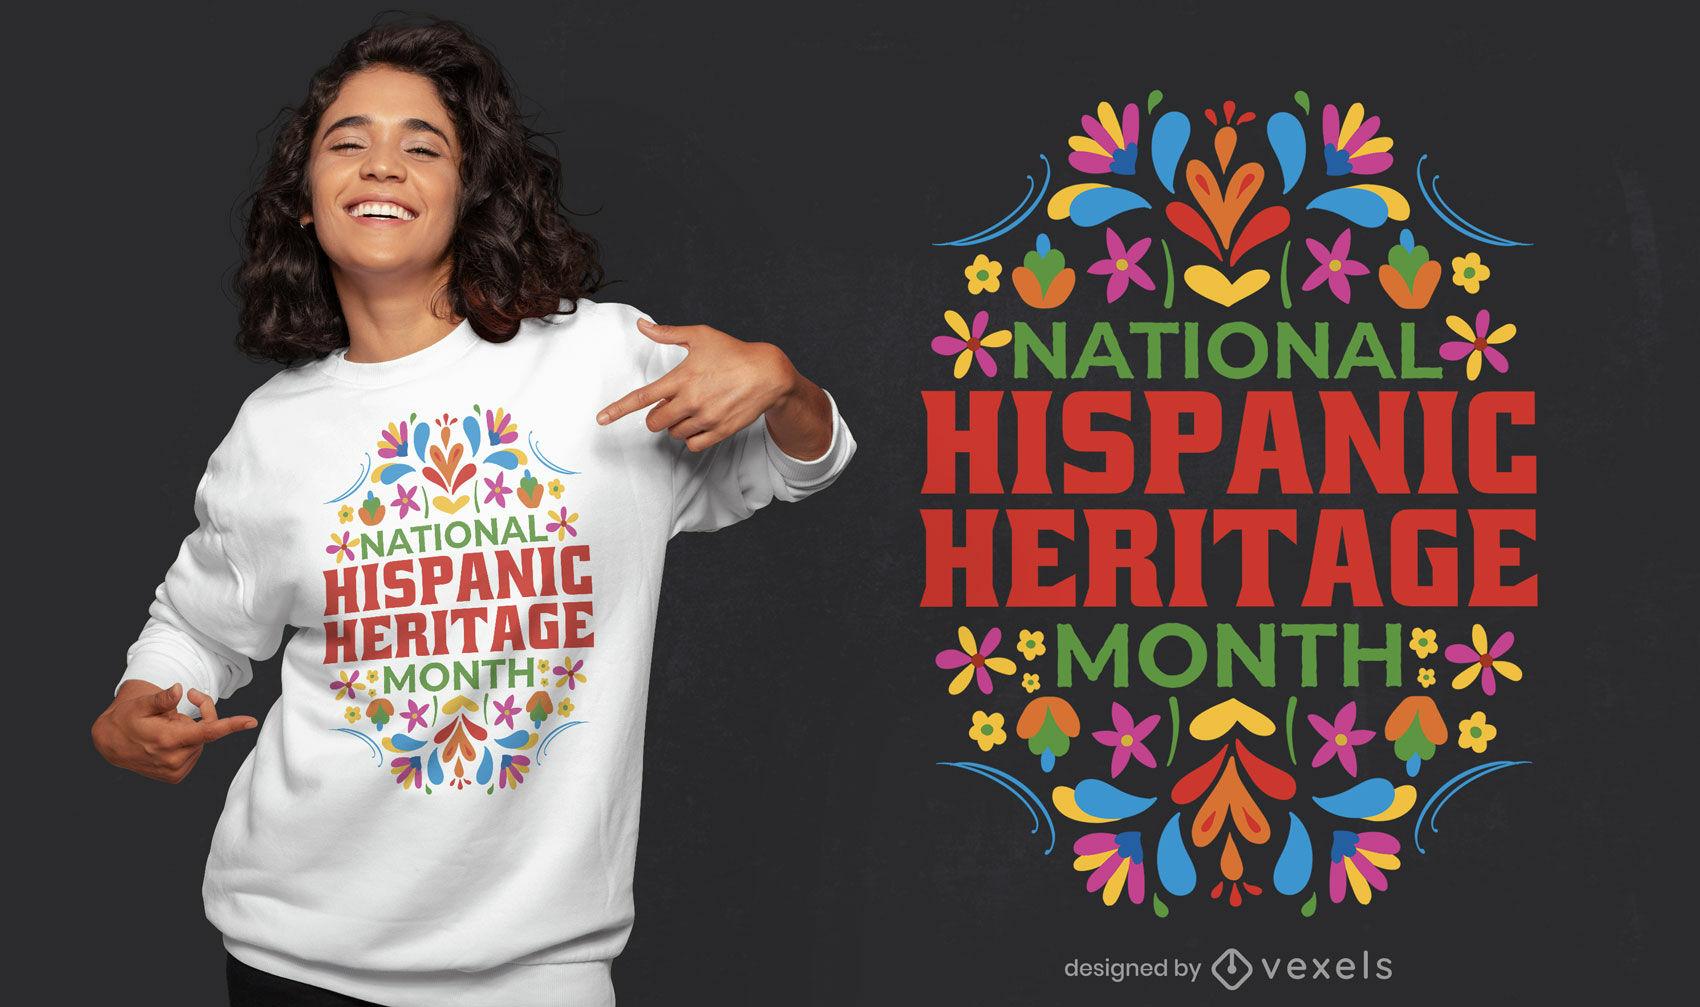 Floral hispanic heritage t-shirt design